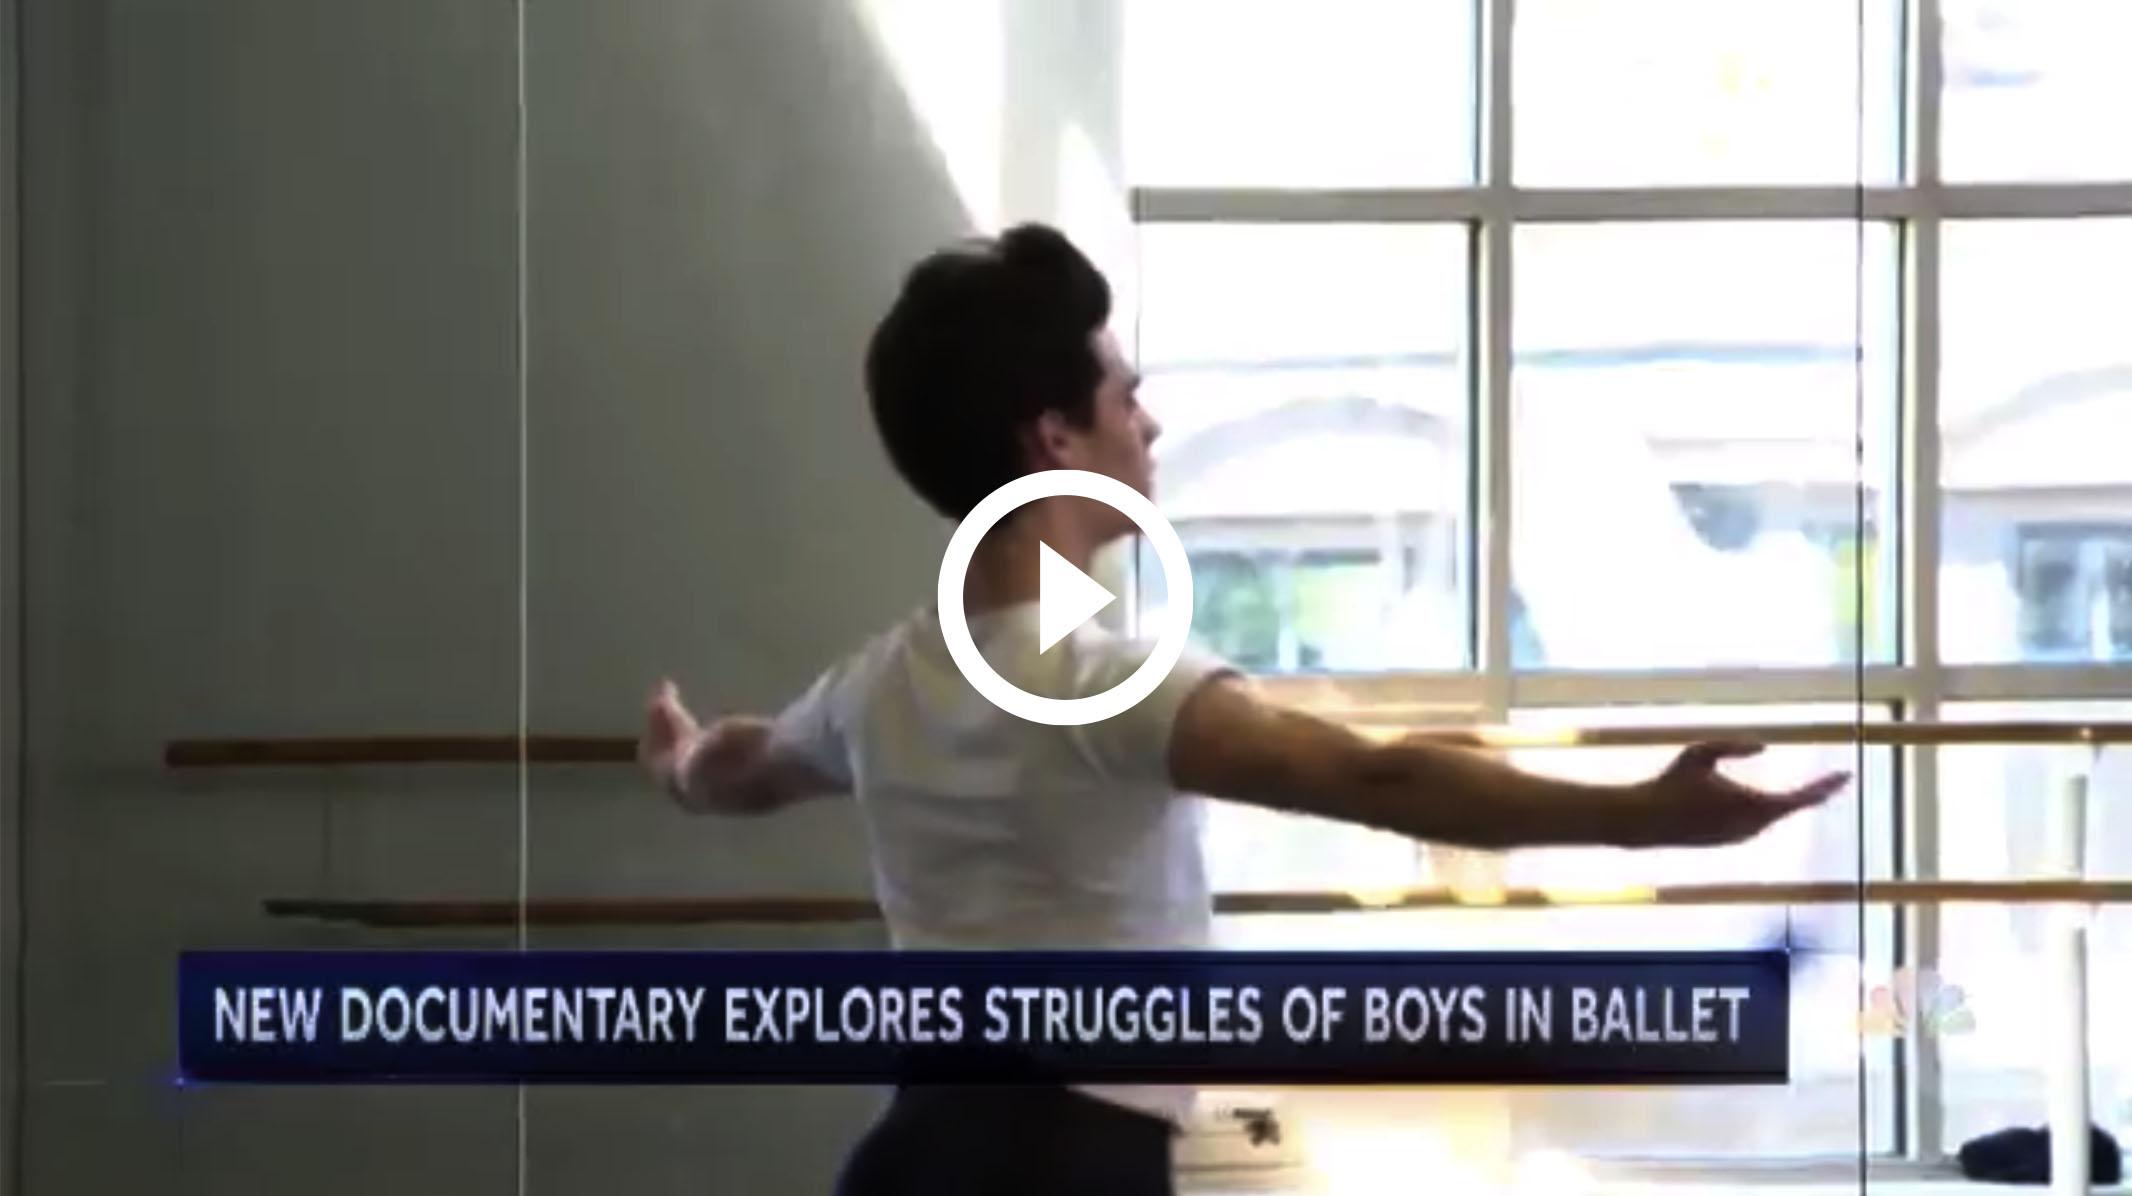 New documentary explores struggles of boys in ballet